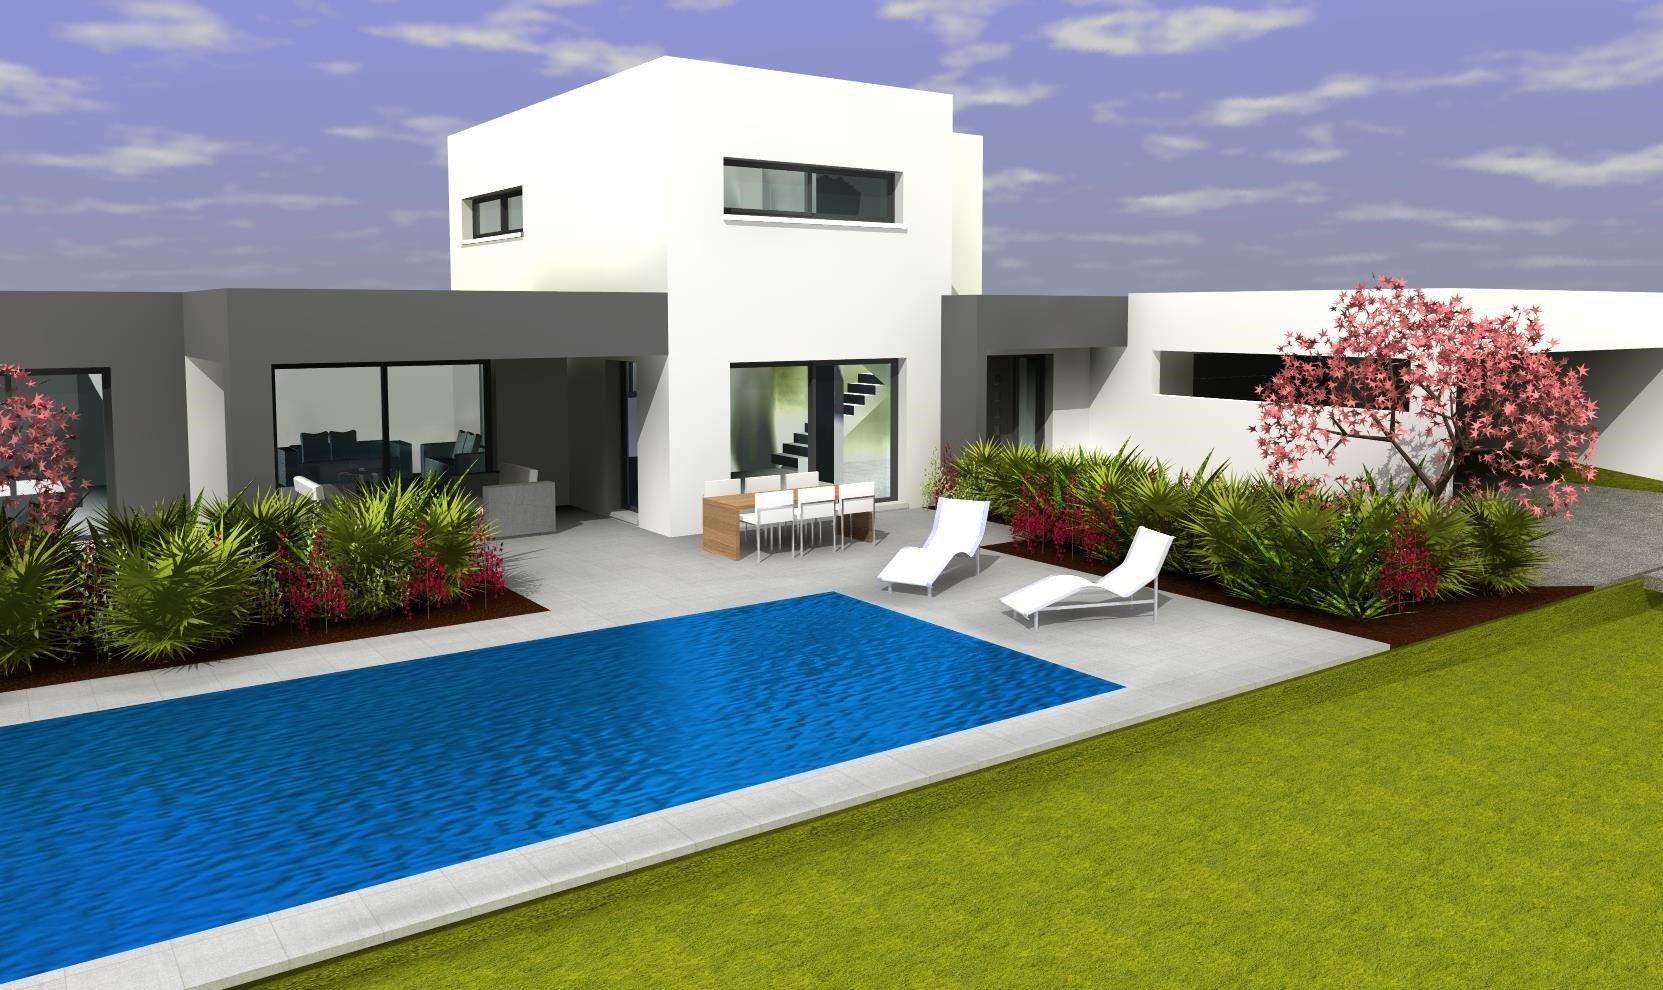 maison toît terrasse 2